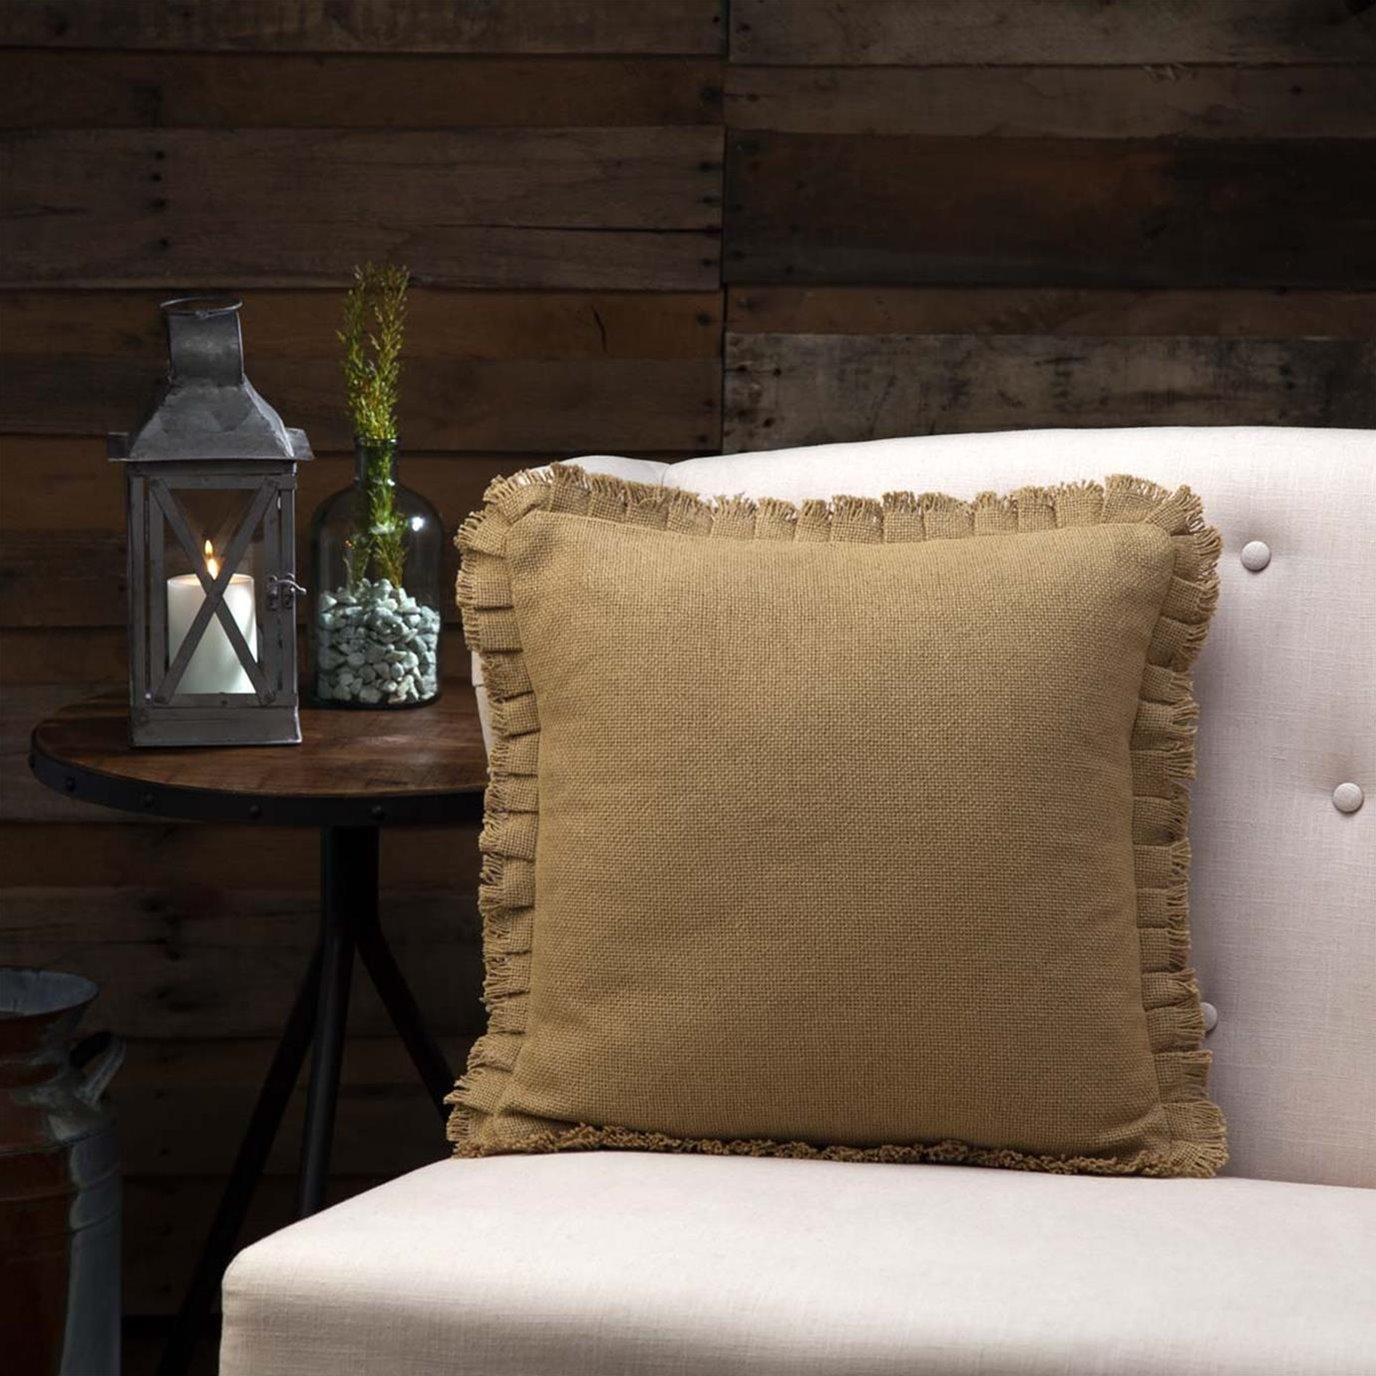 Burlap Natural Fringed Pillow